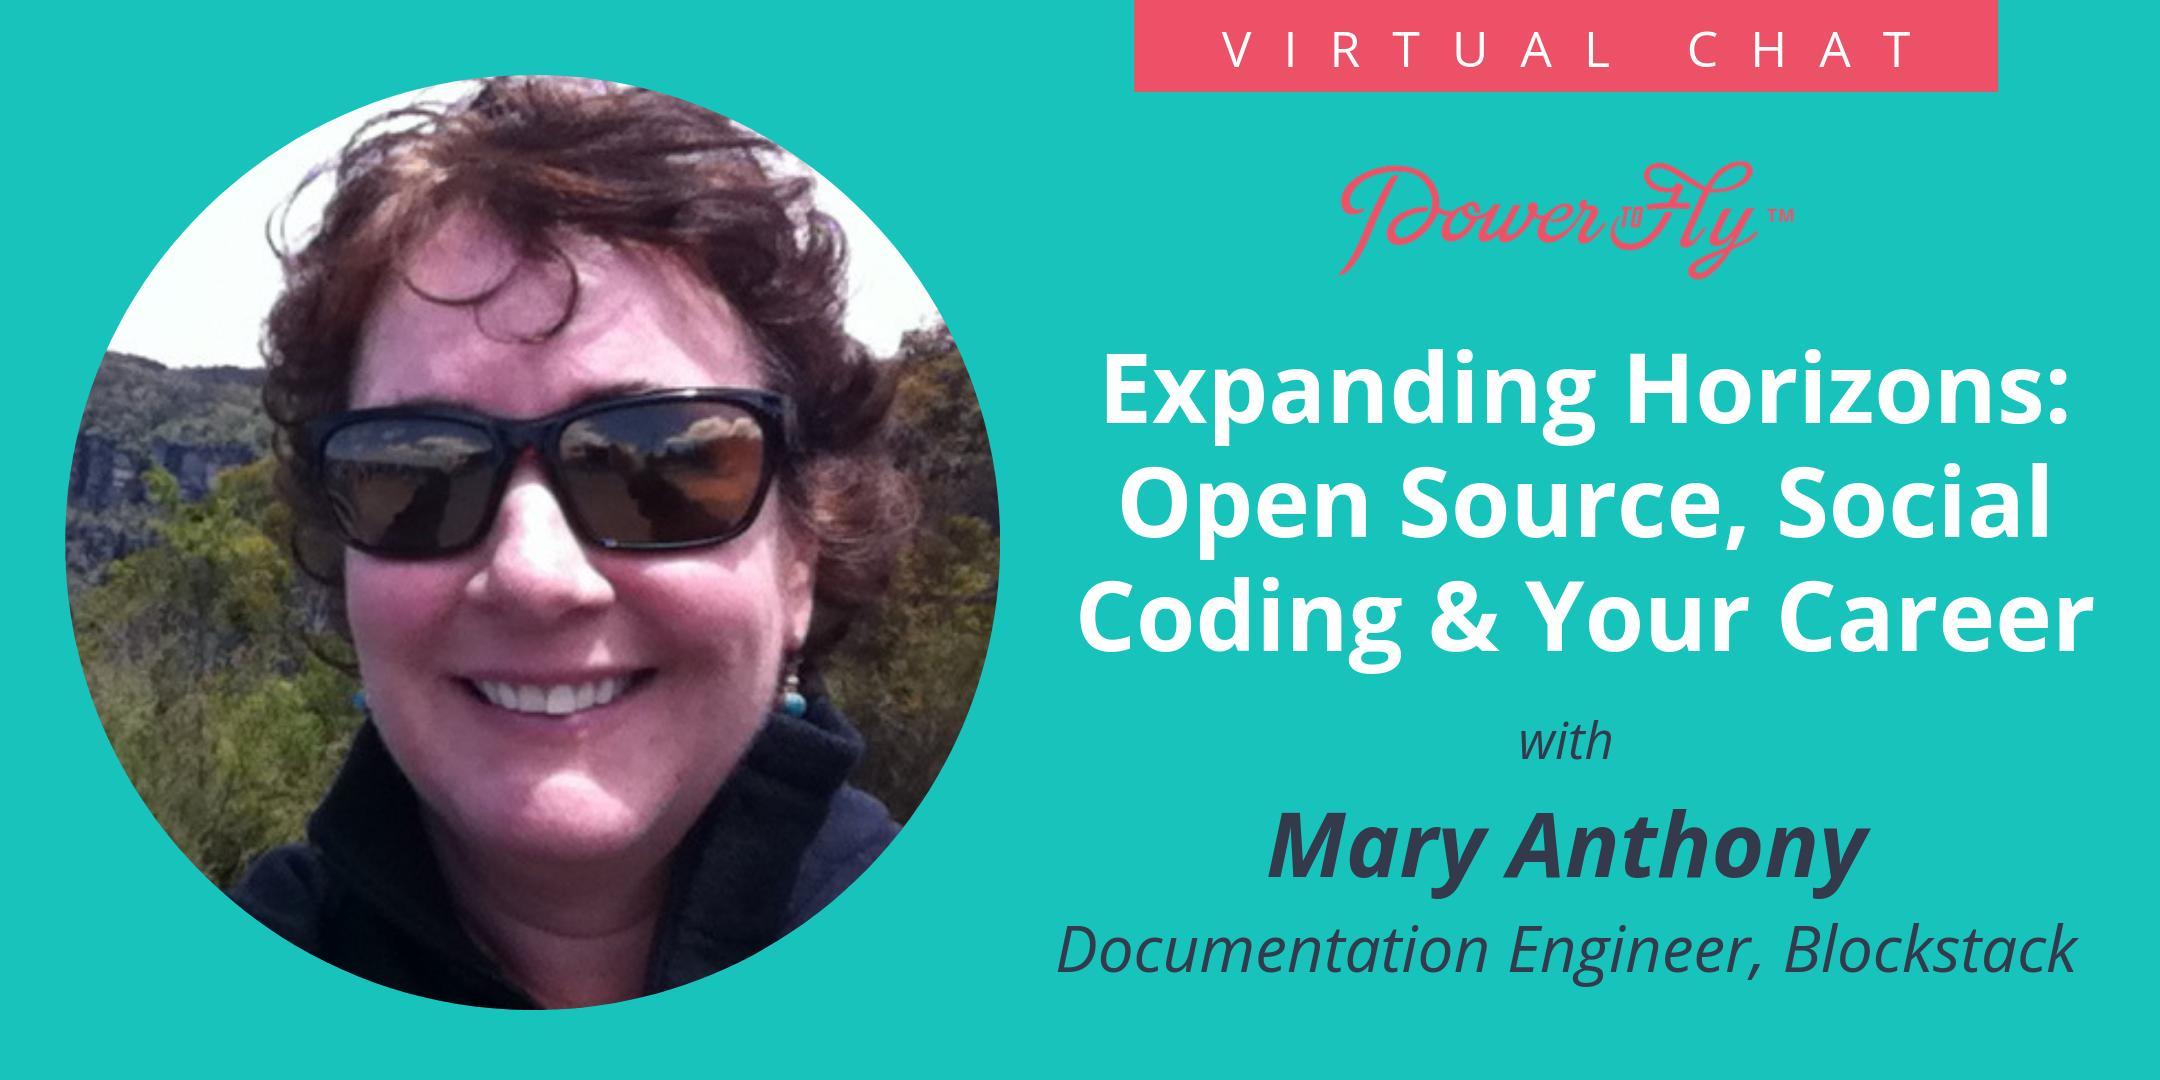 Expanding Horizons: Open Source, Social Coding & Your Career